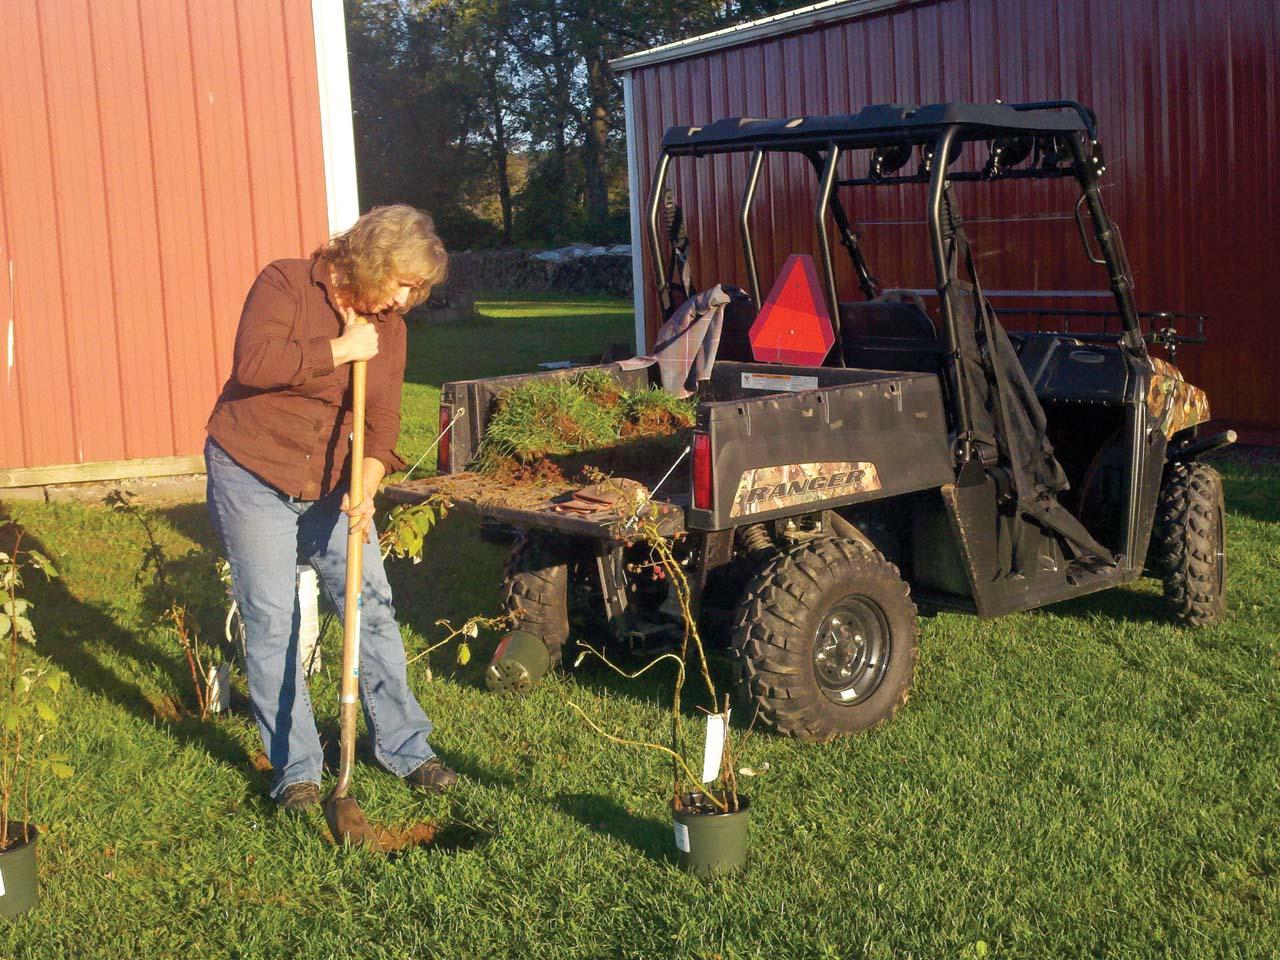 Farm & Field Tested - The Polaris Ranger 500 EFI | ATV Illustrated